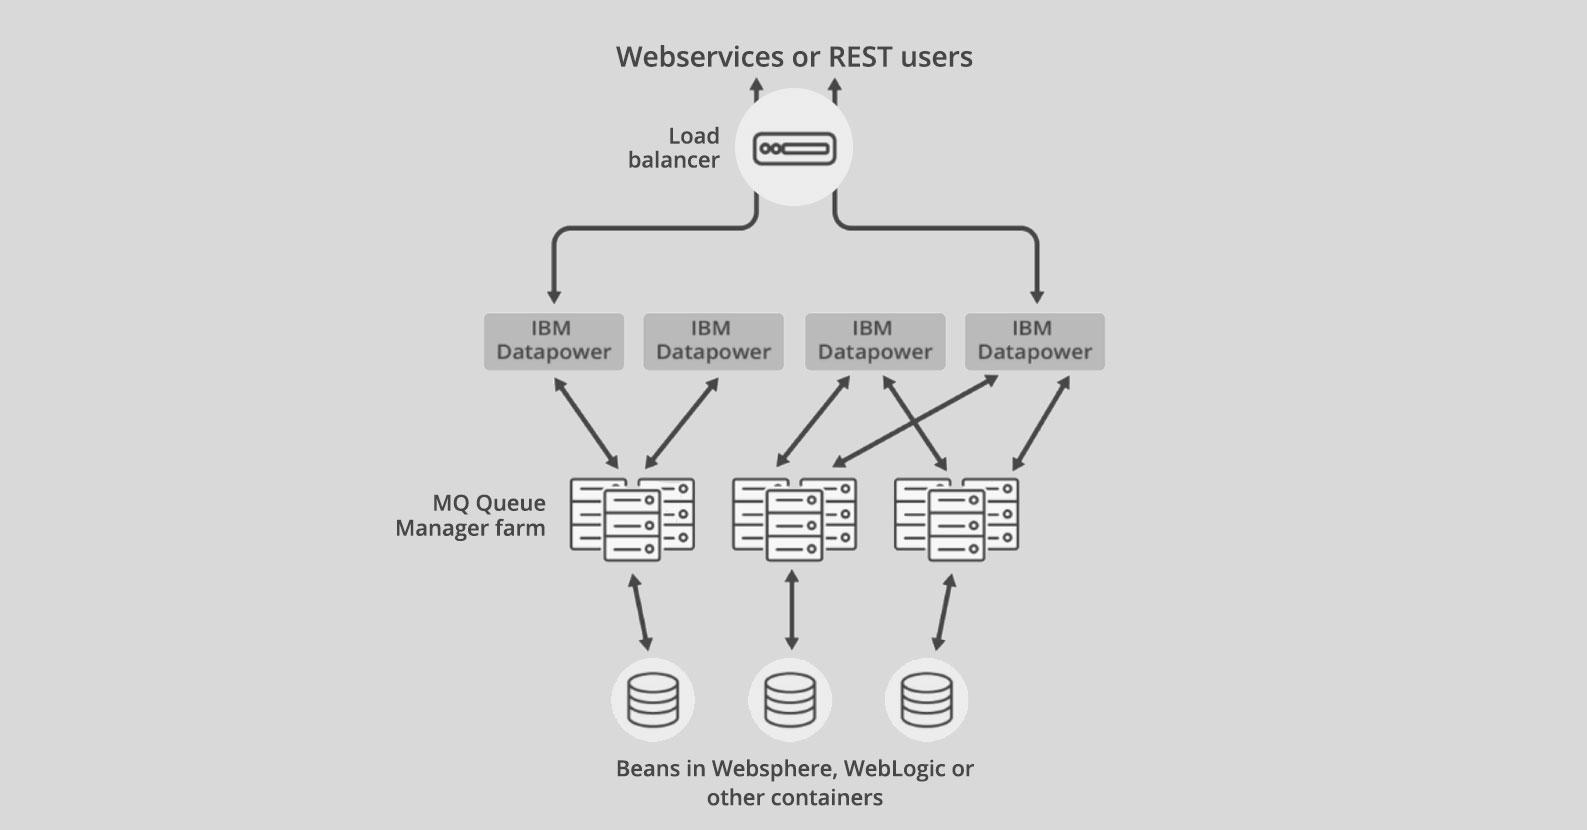 Using DataPower as a B2B/B2C Gateway - Before